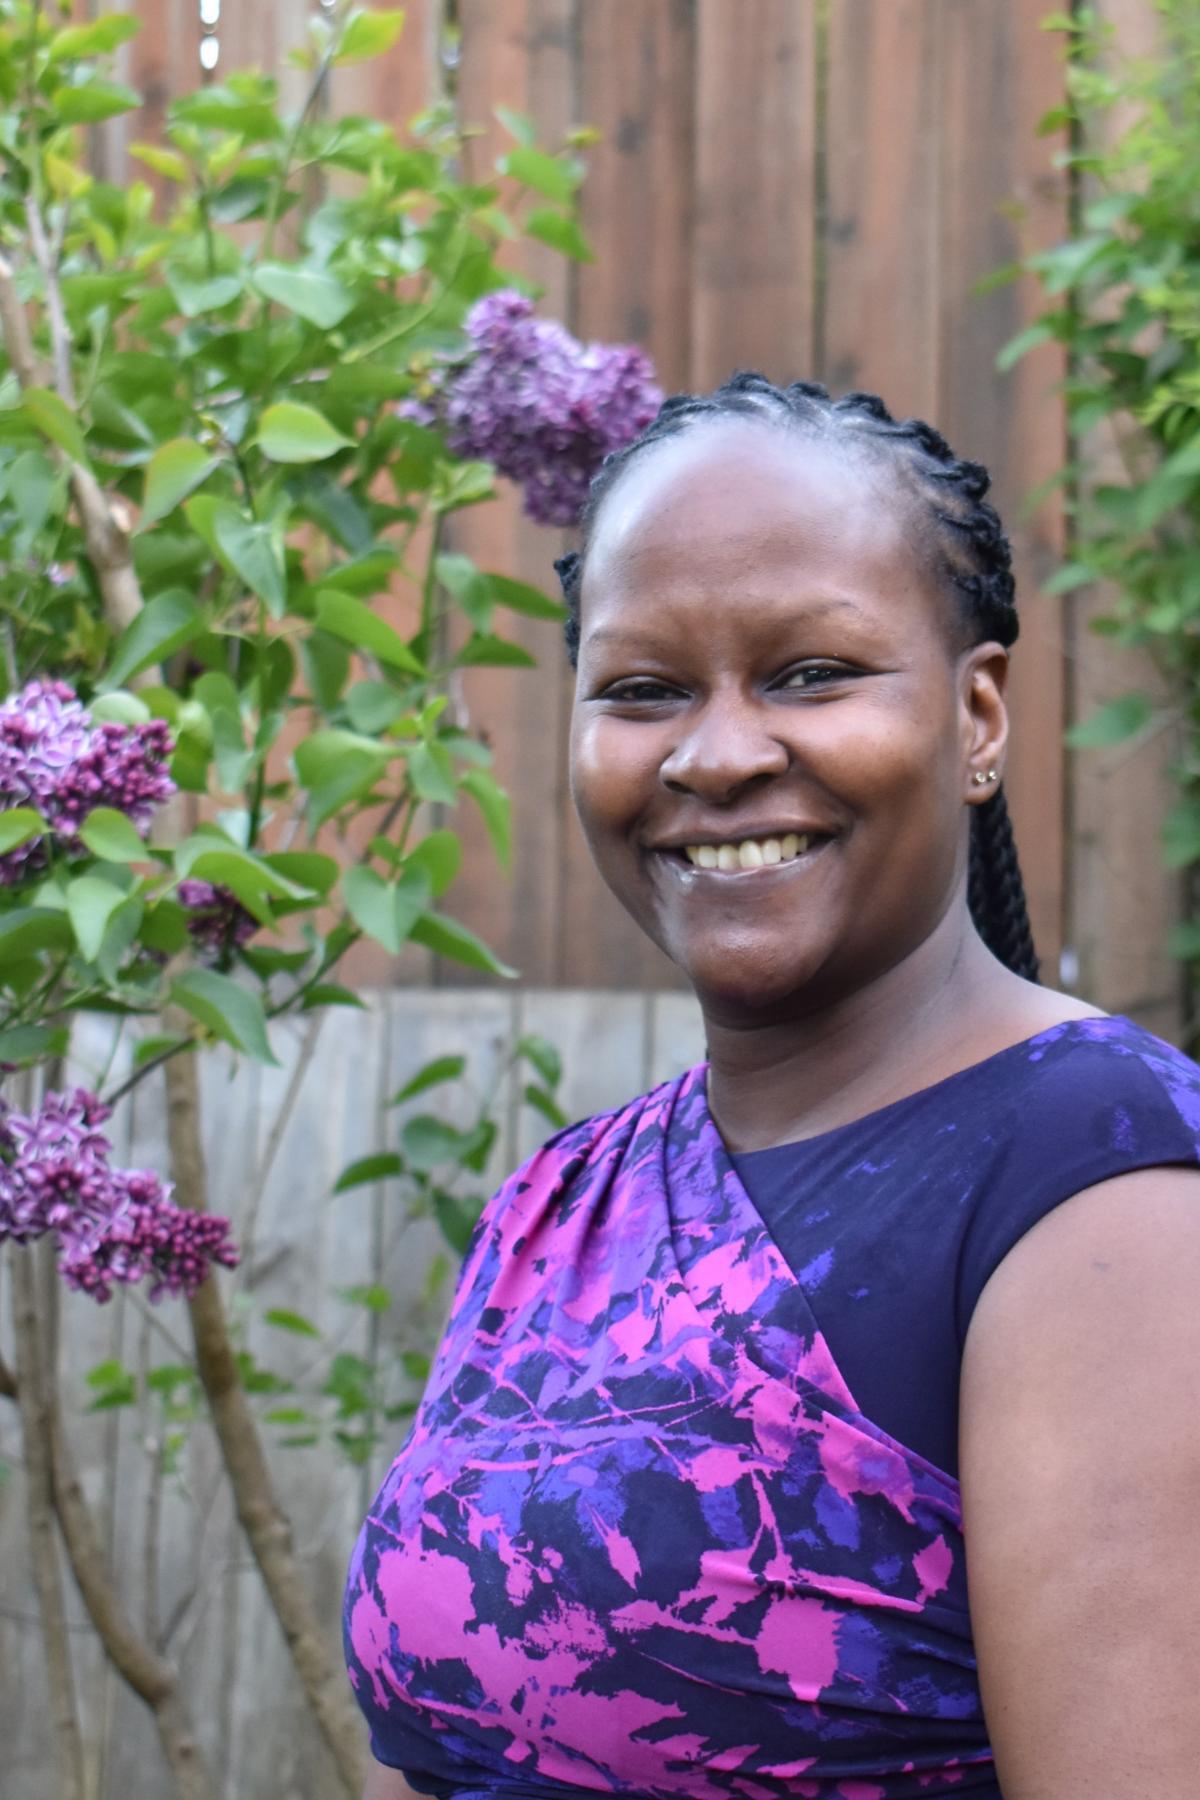 Portrait of Beatrice Wamuti